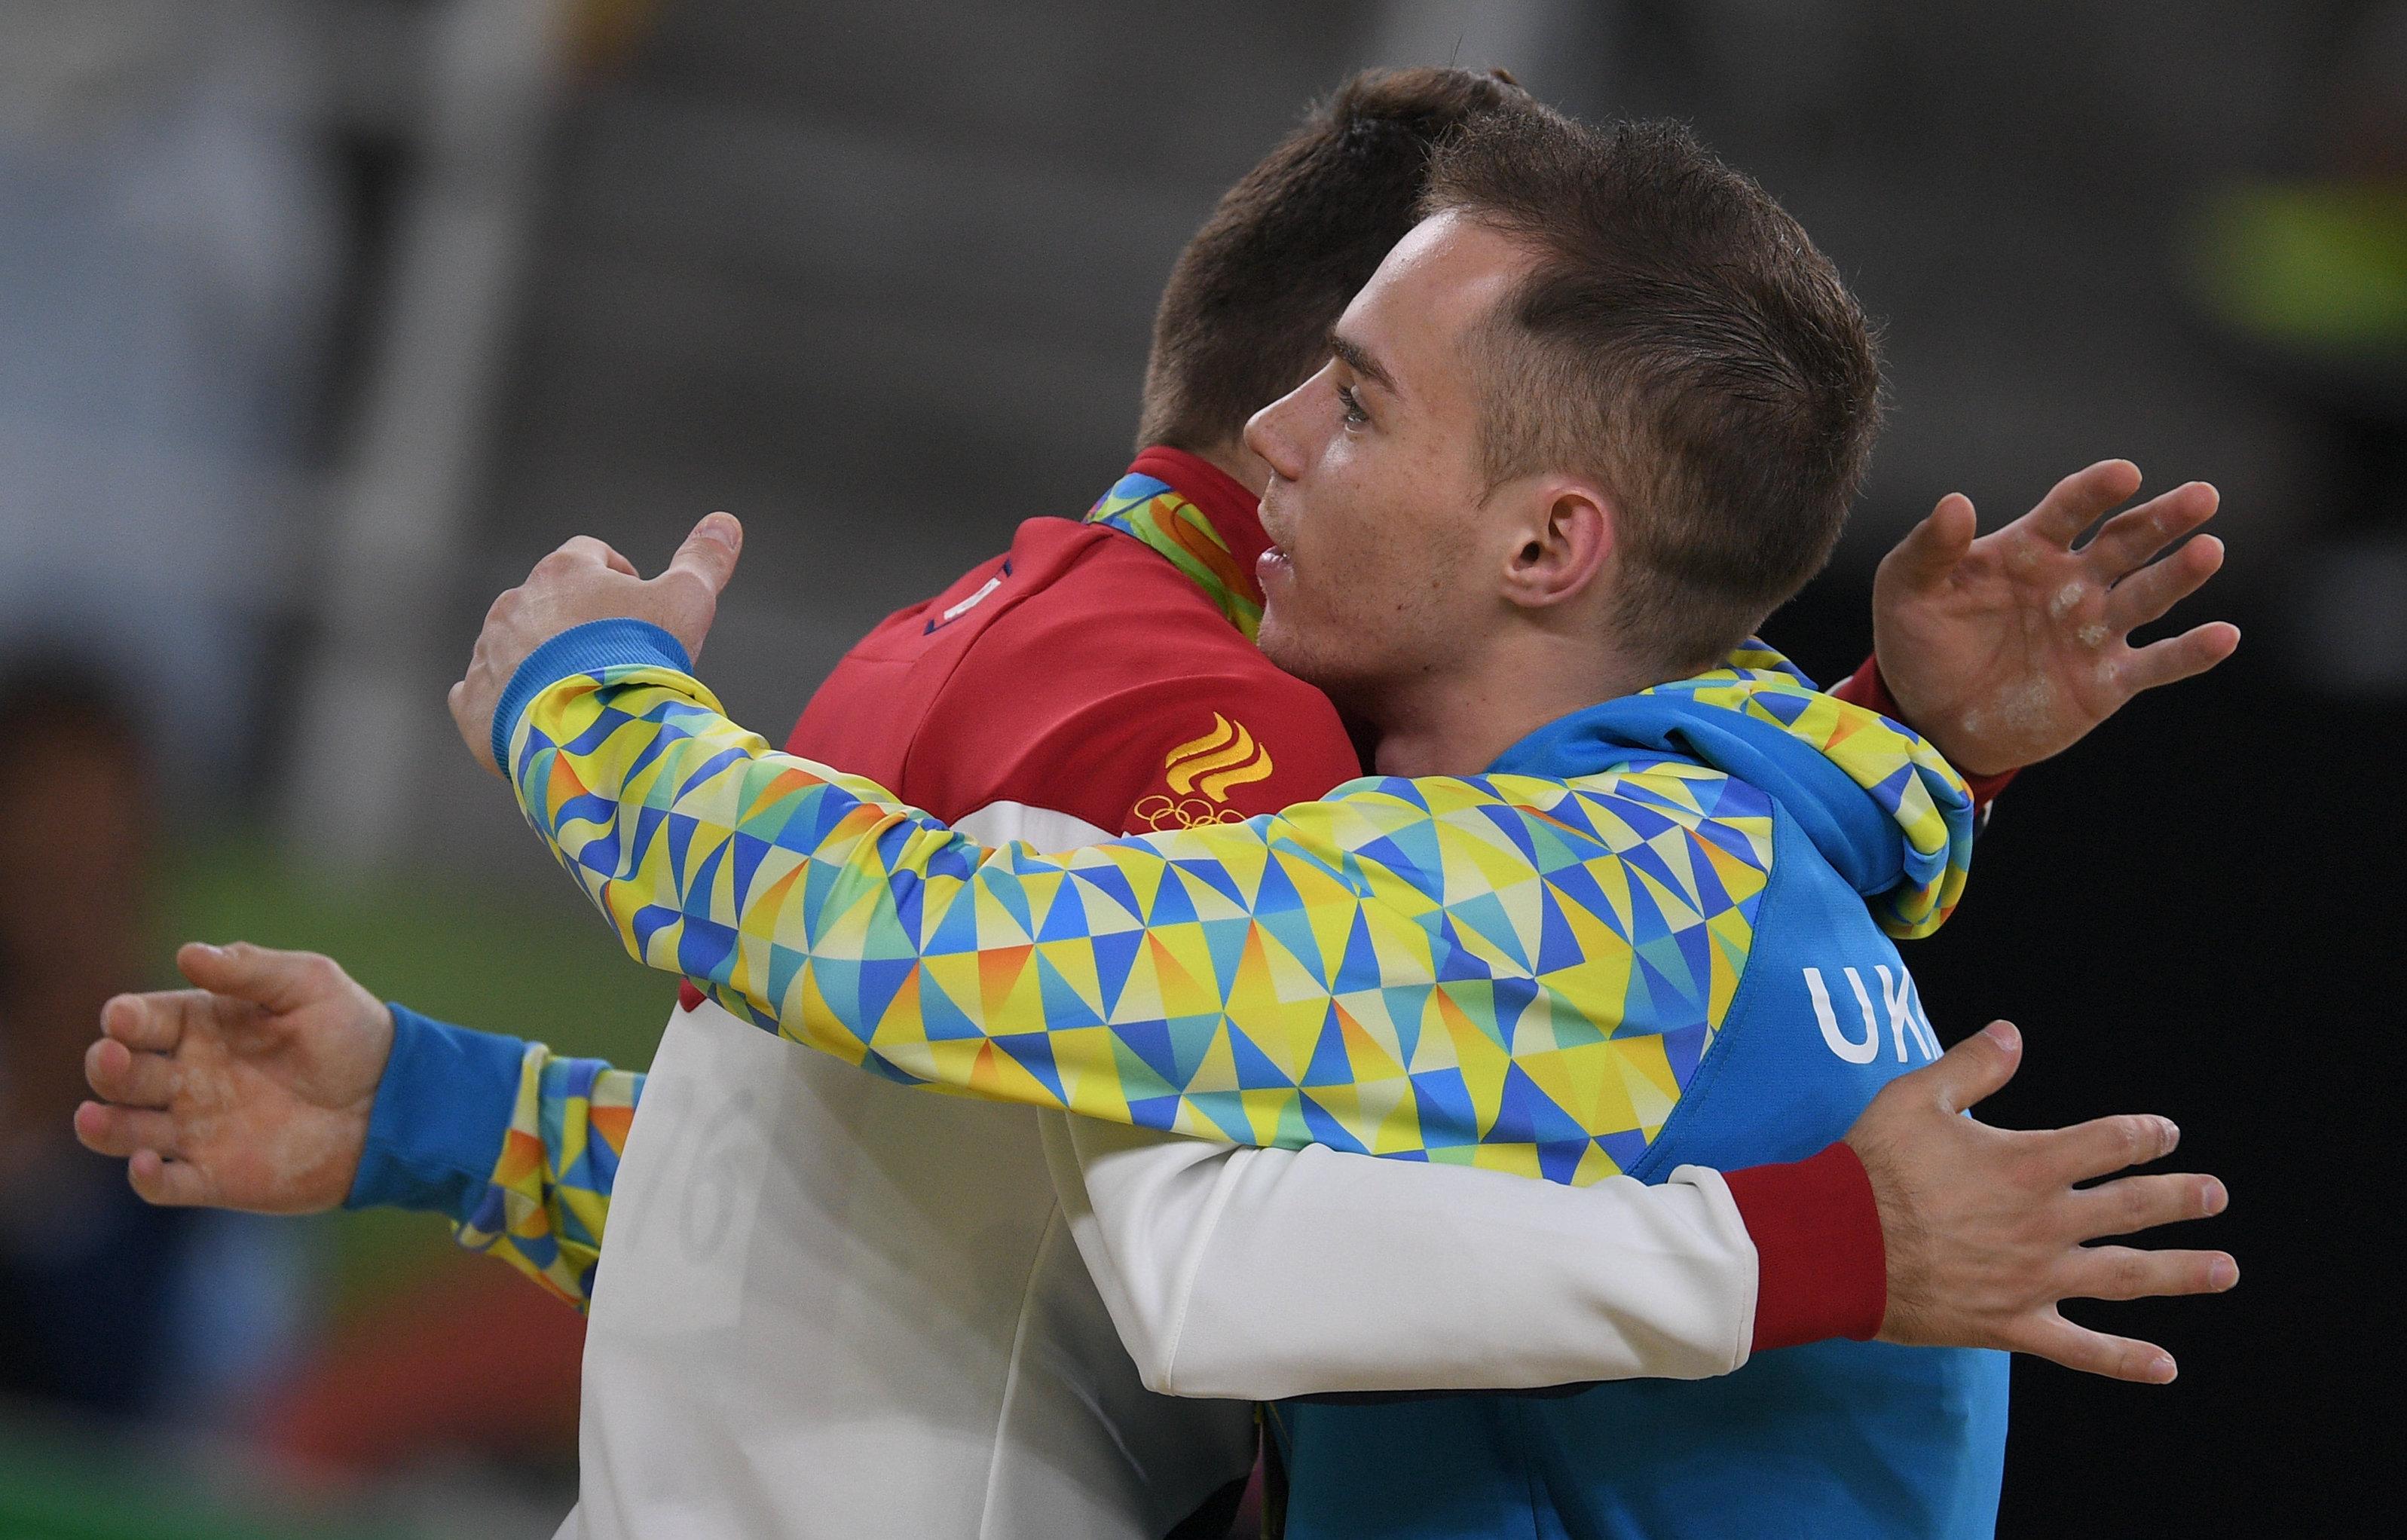 L'Ukrainien Oleg Verniaiev et le Russe David Belyavskiy